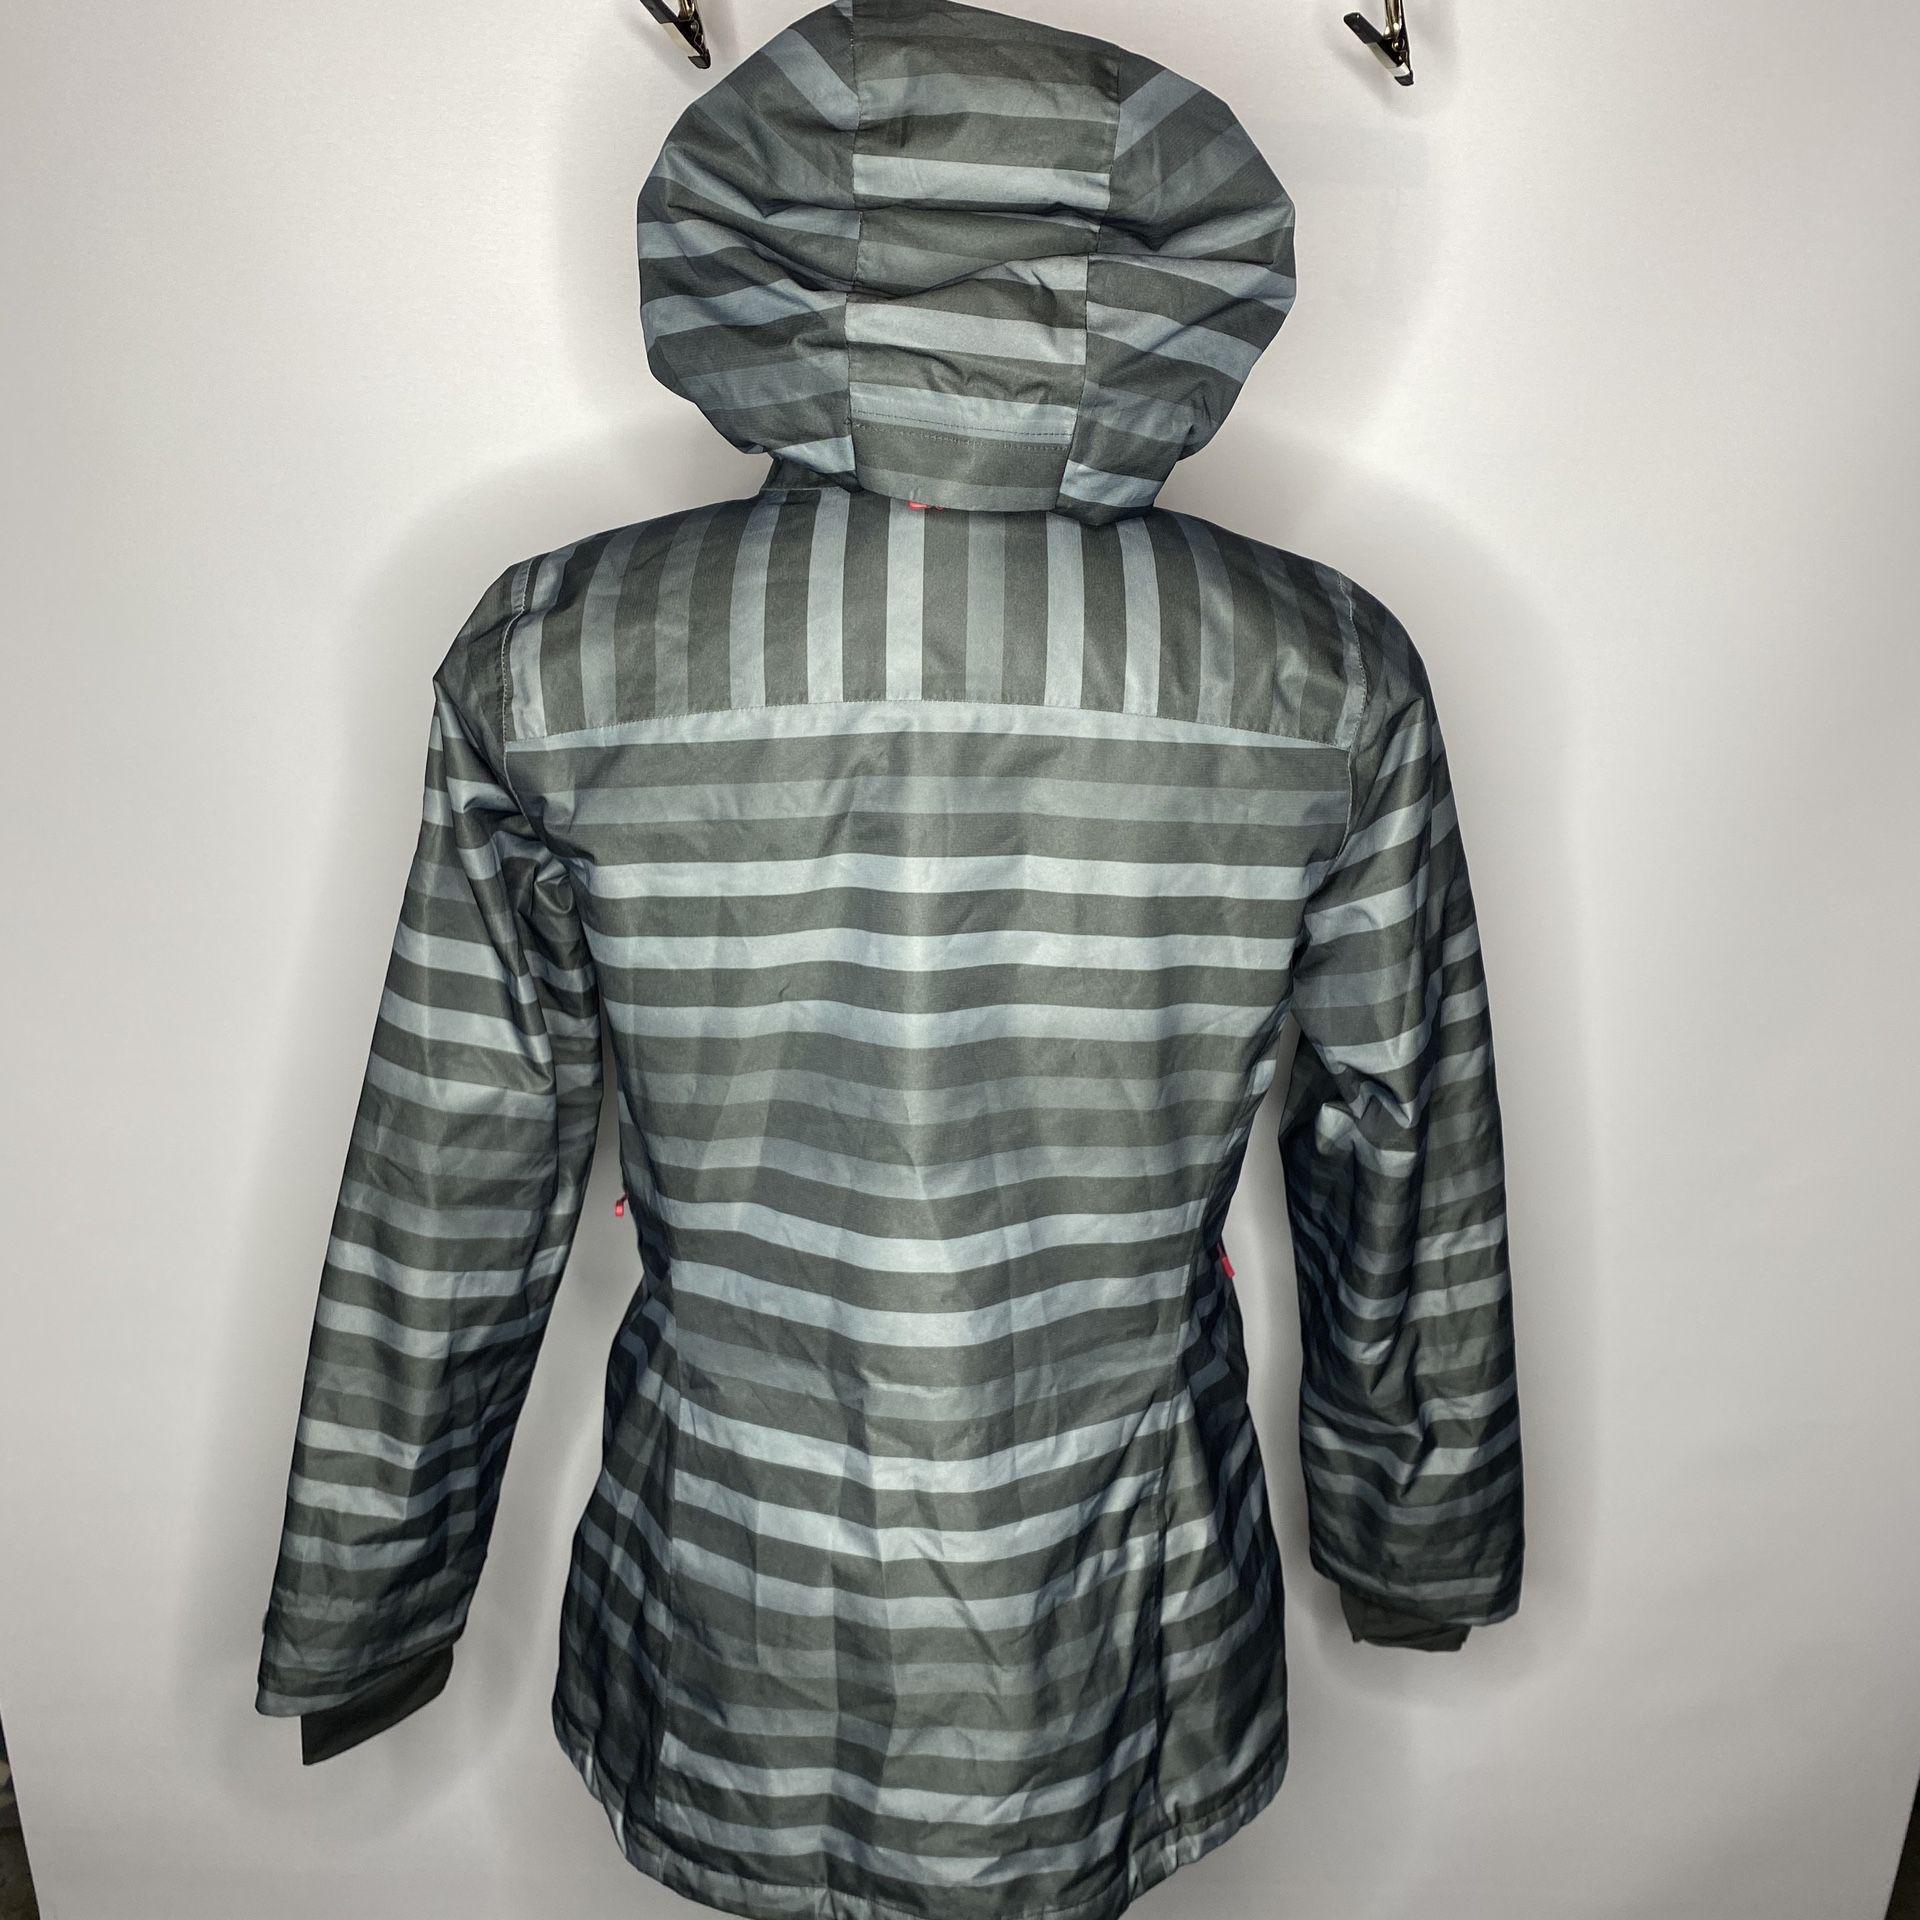 Womens XL - Mountain Hardwear Dry.Q Thermal.Q Waterproof Ski/Snowboard Jacket